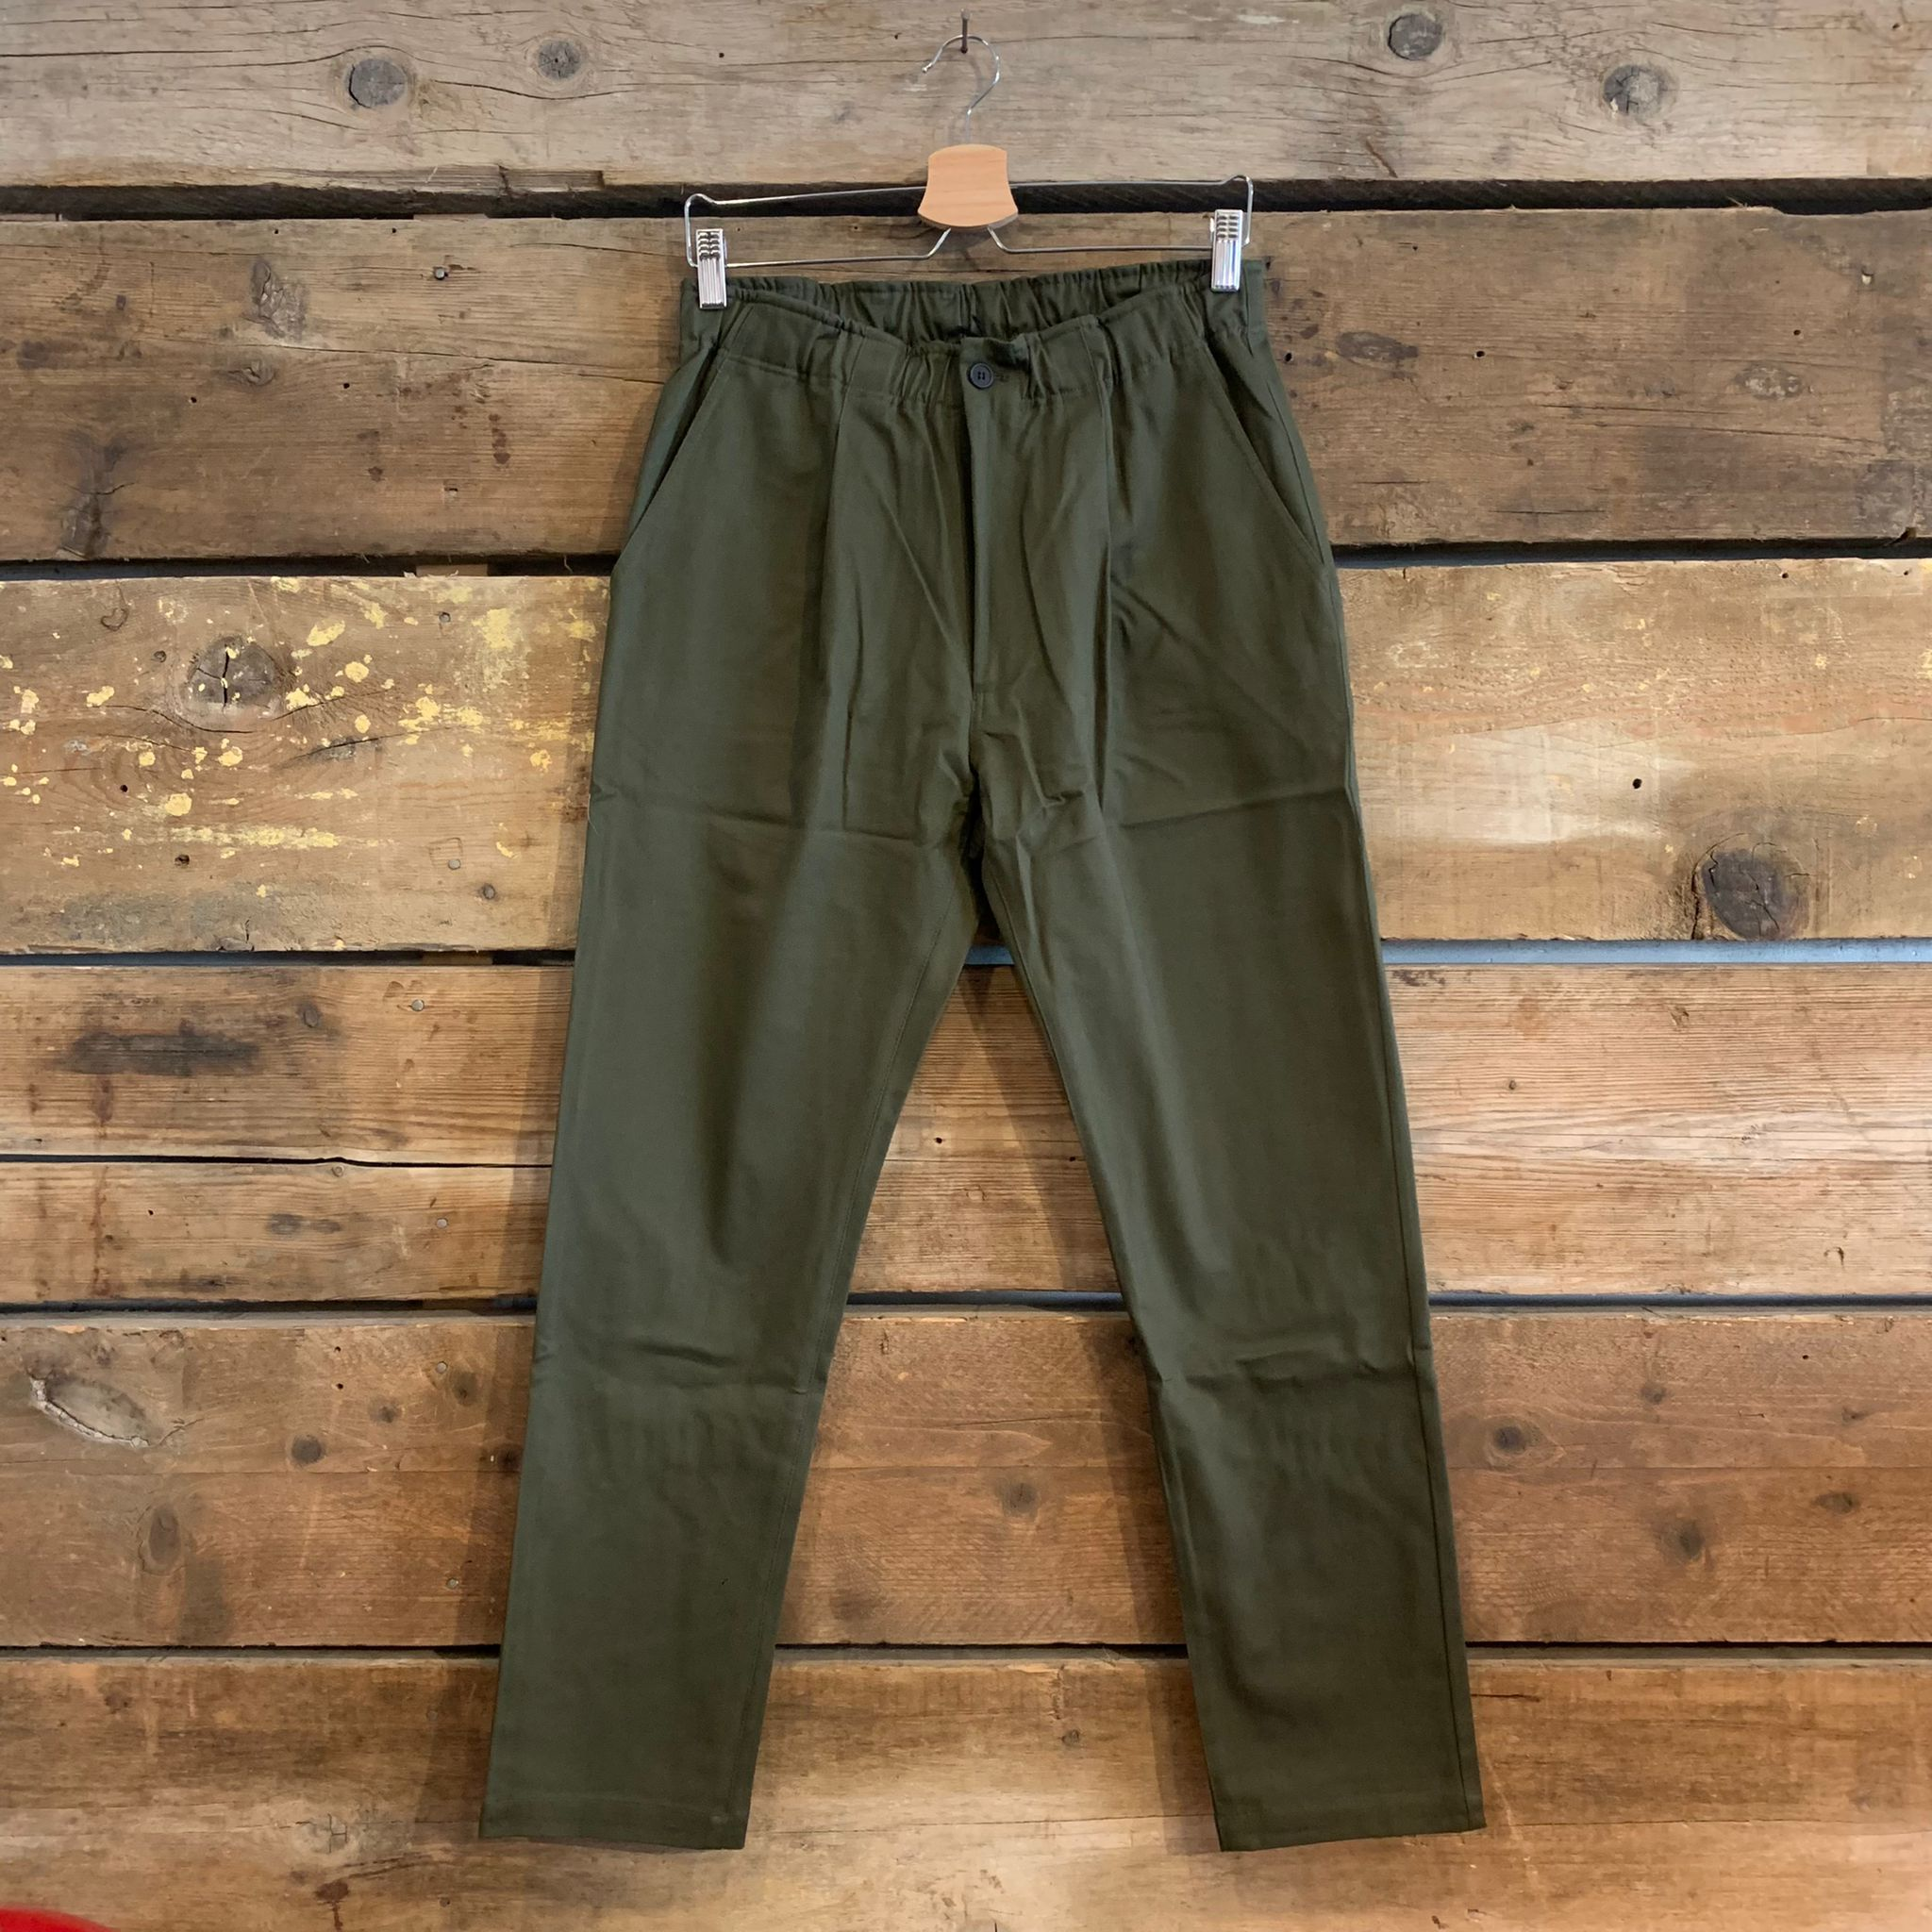 Pantalone Bakery Supplies Lowan Gabardine Verde Oliva FW21